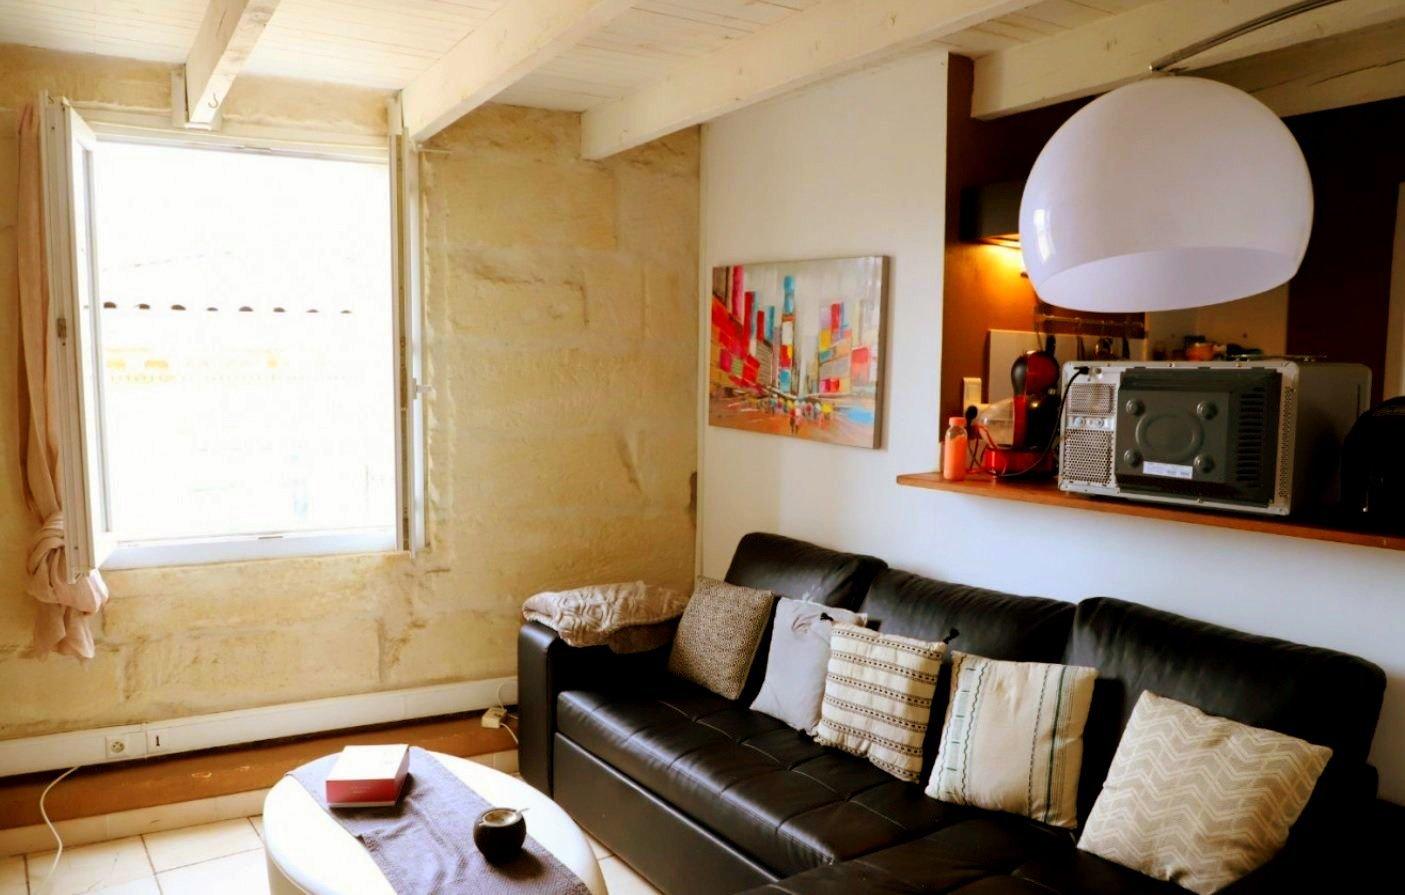 Appartement duplex dans immeuble Haussmannien